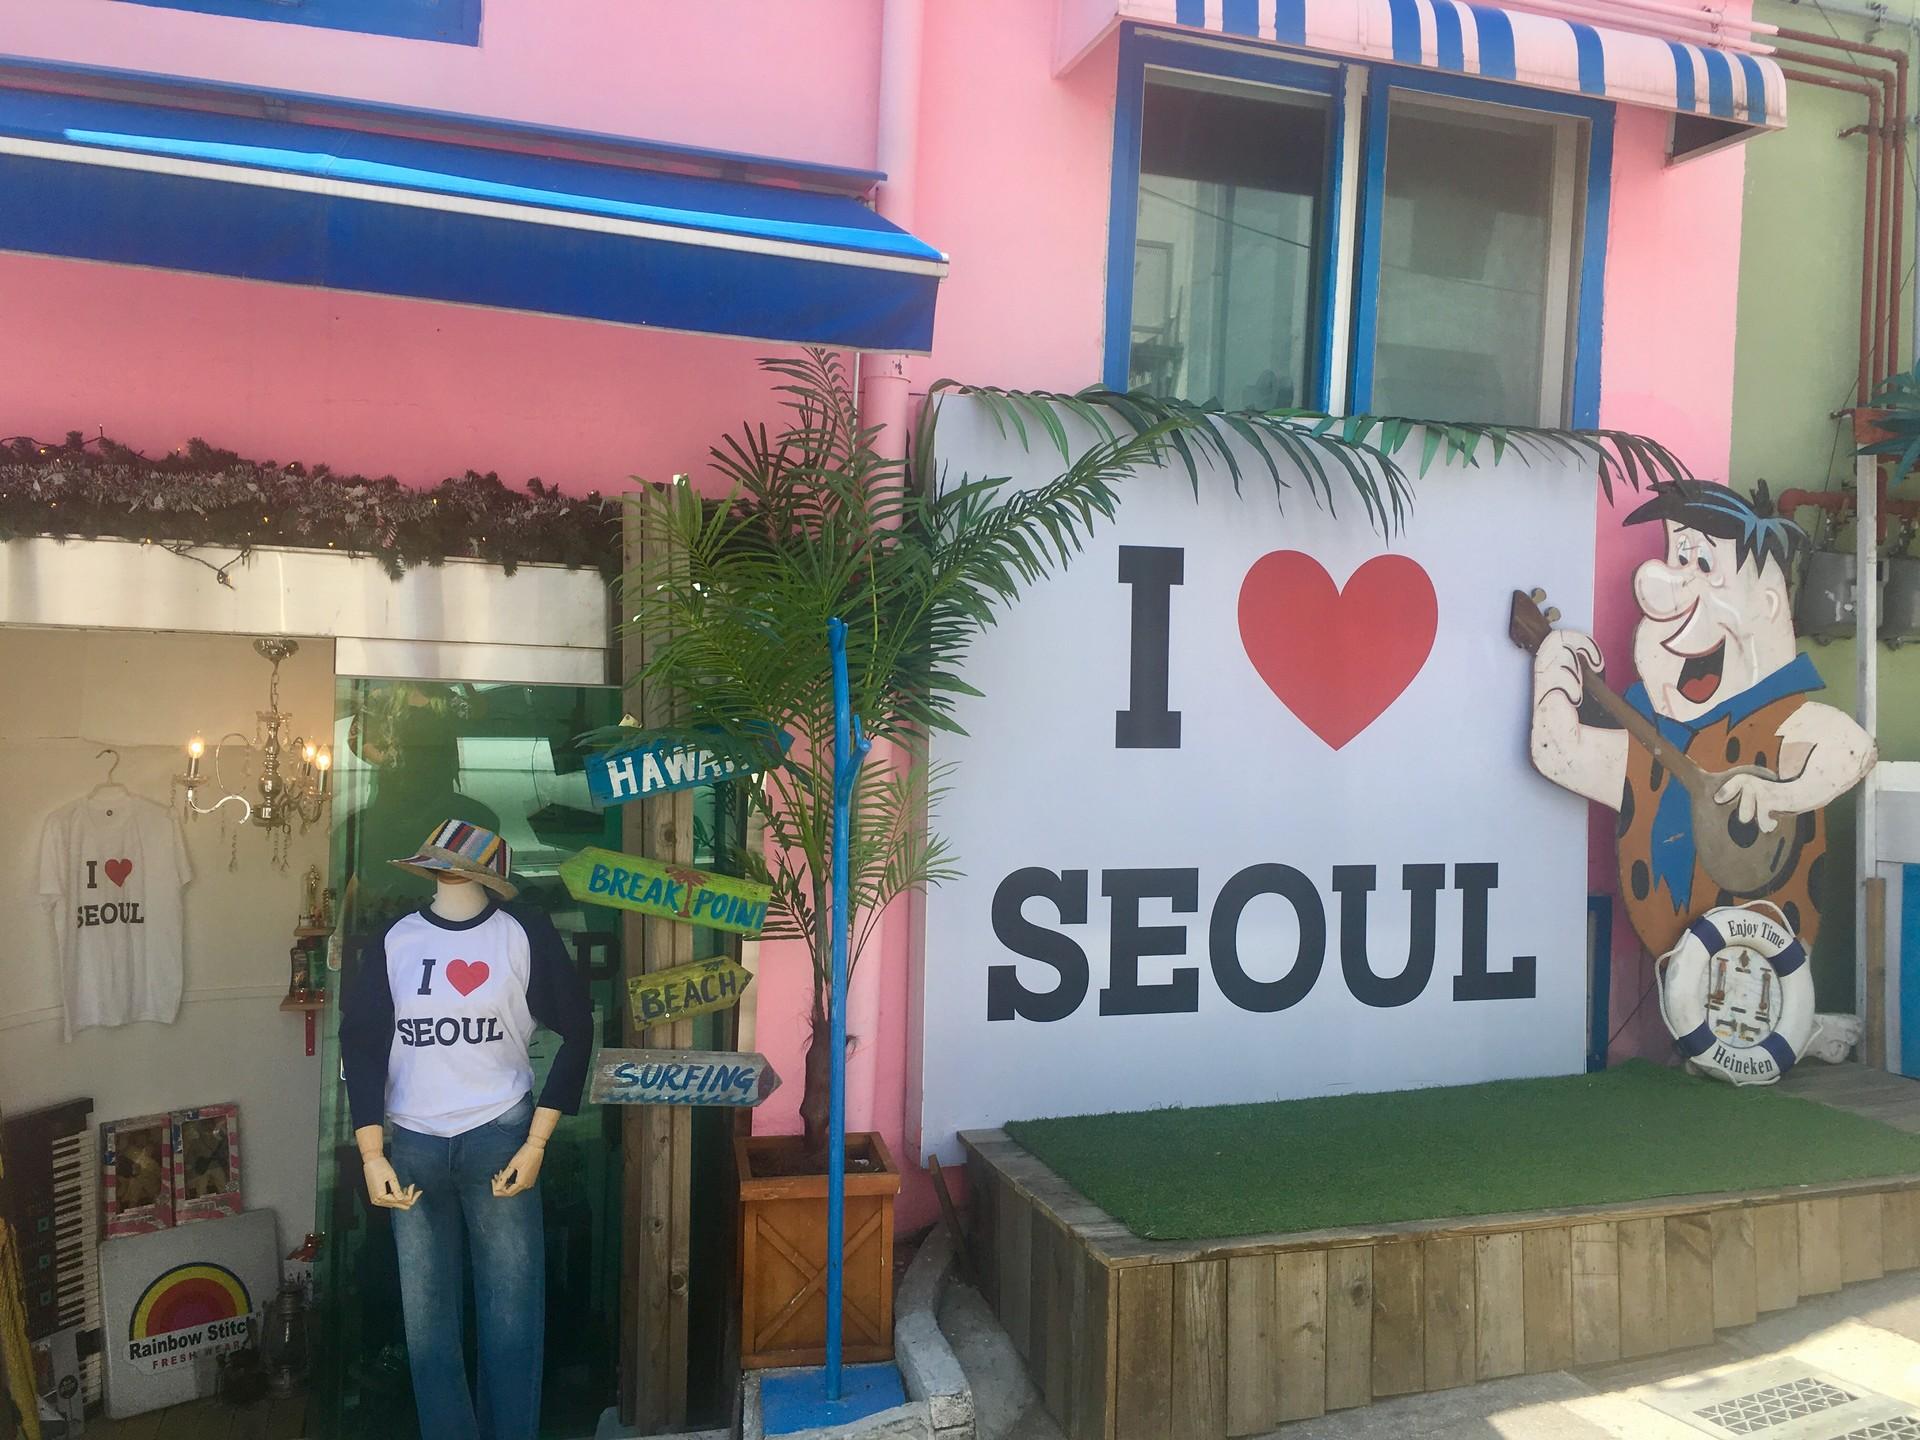 seoul-south-korea-b13aa3b9fe4d047a12b7e8